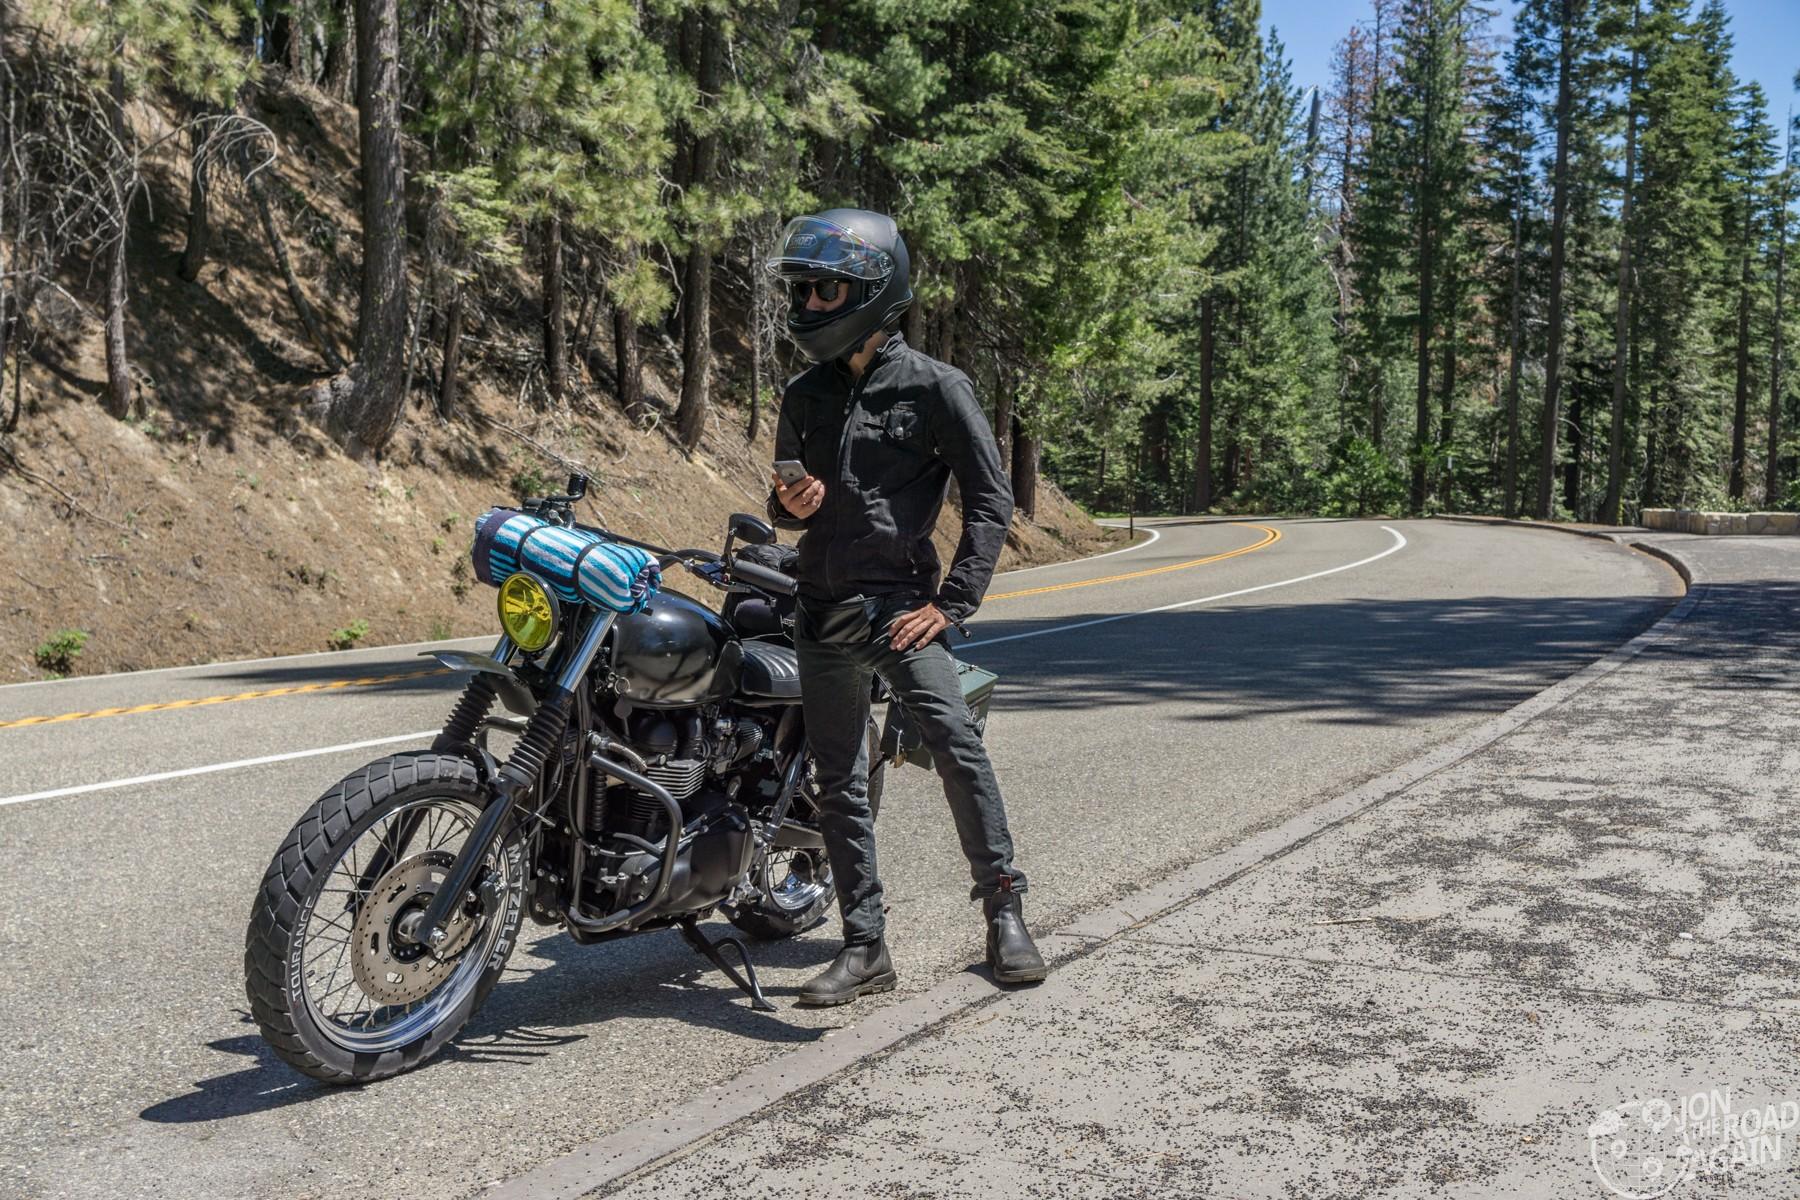 Motorcycling Yosemite National Park